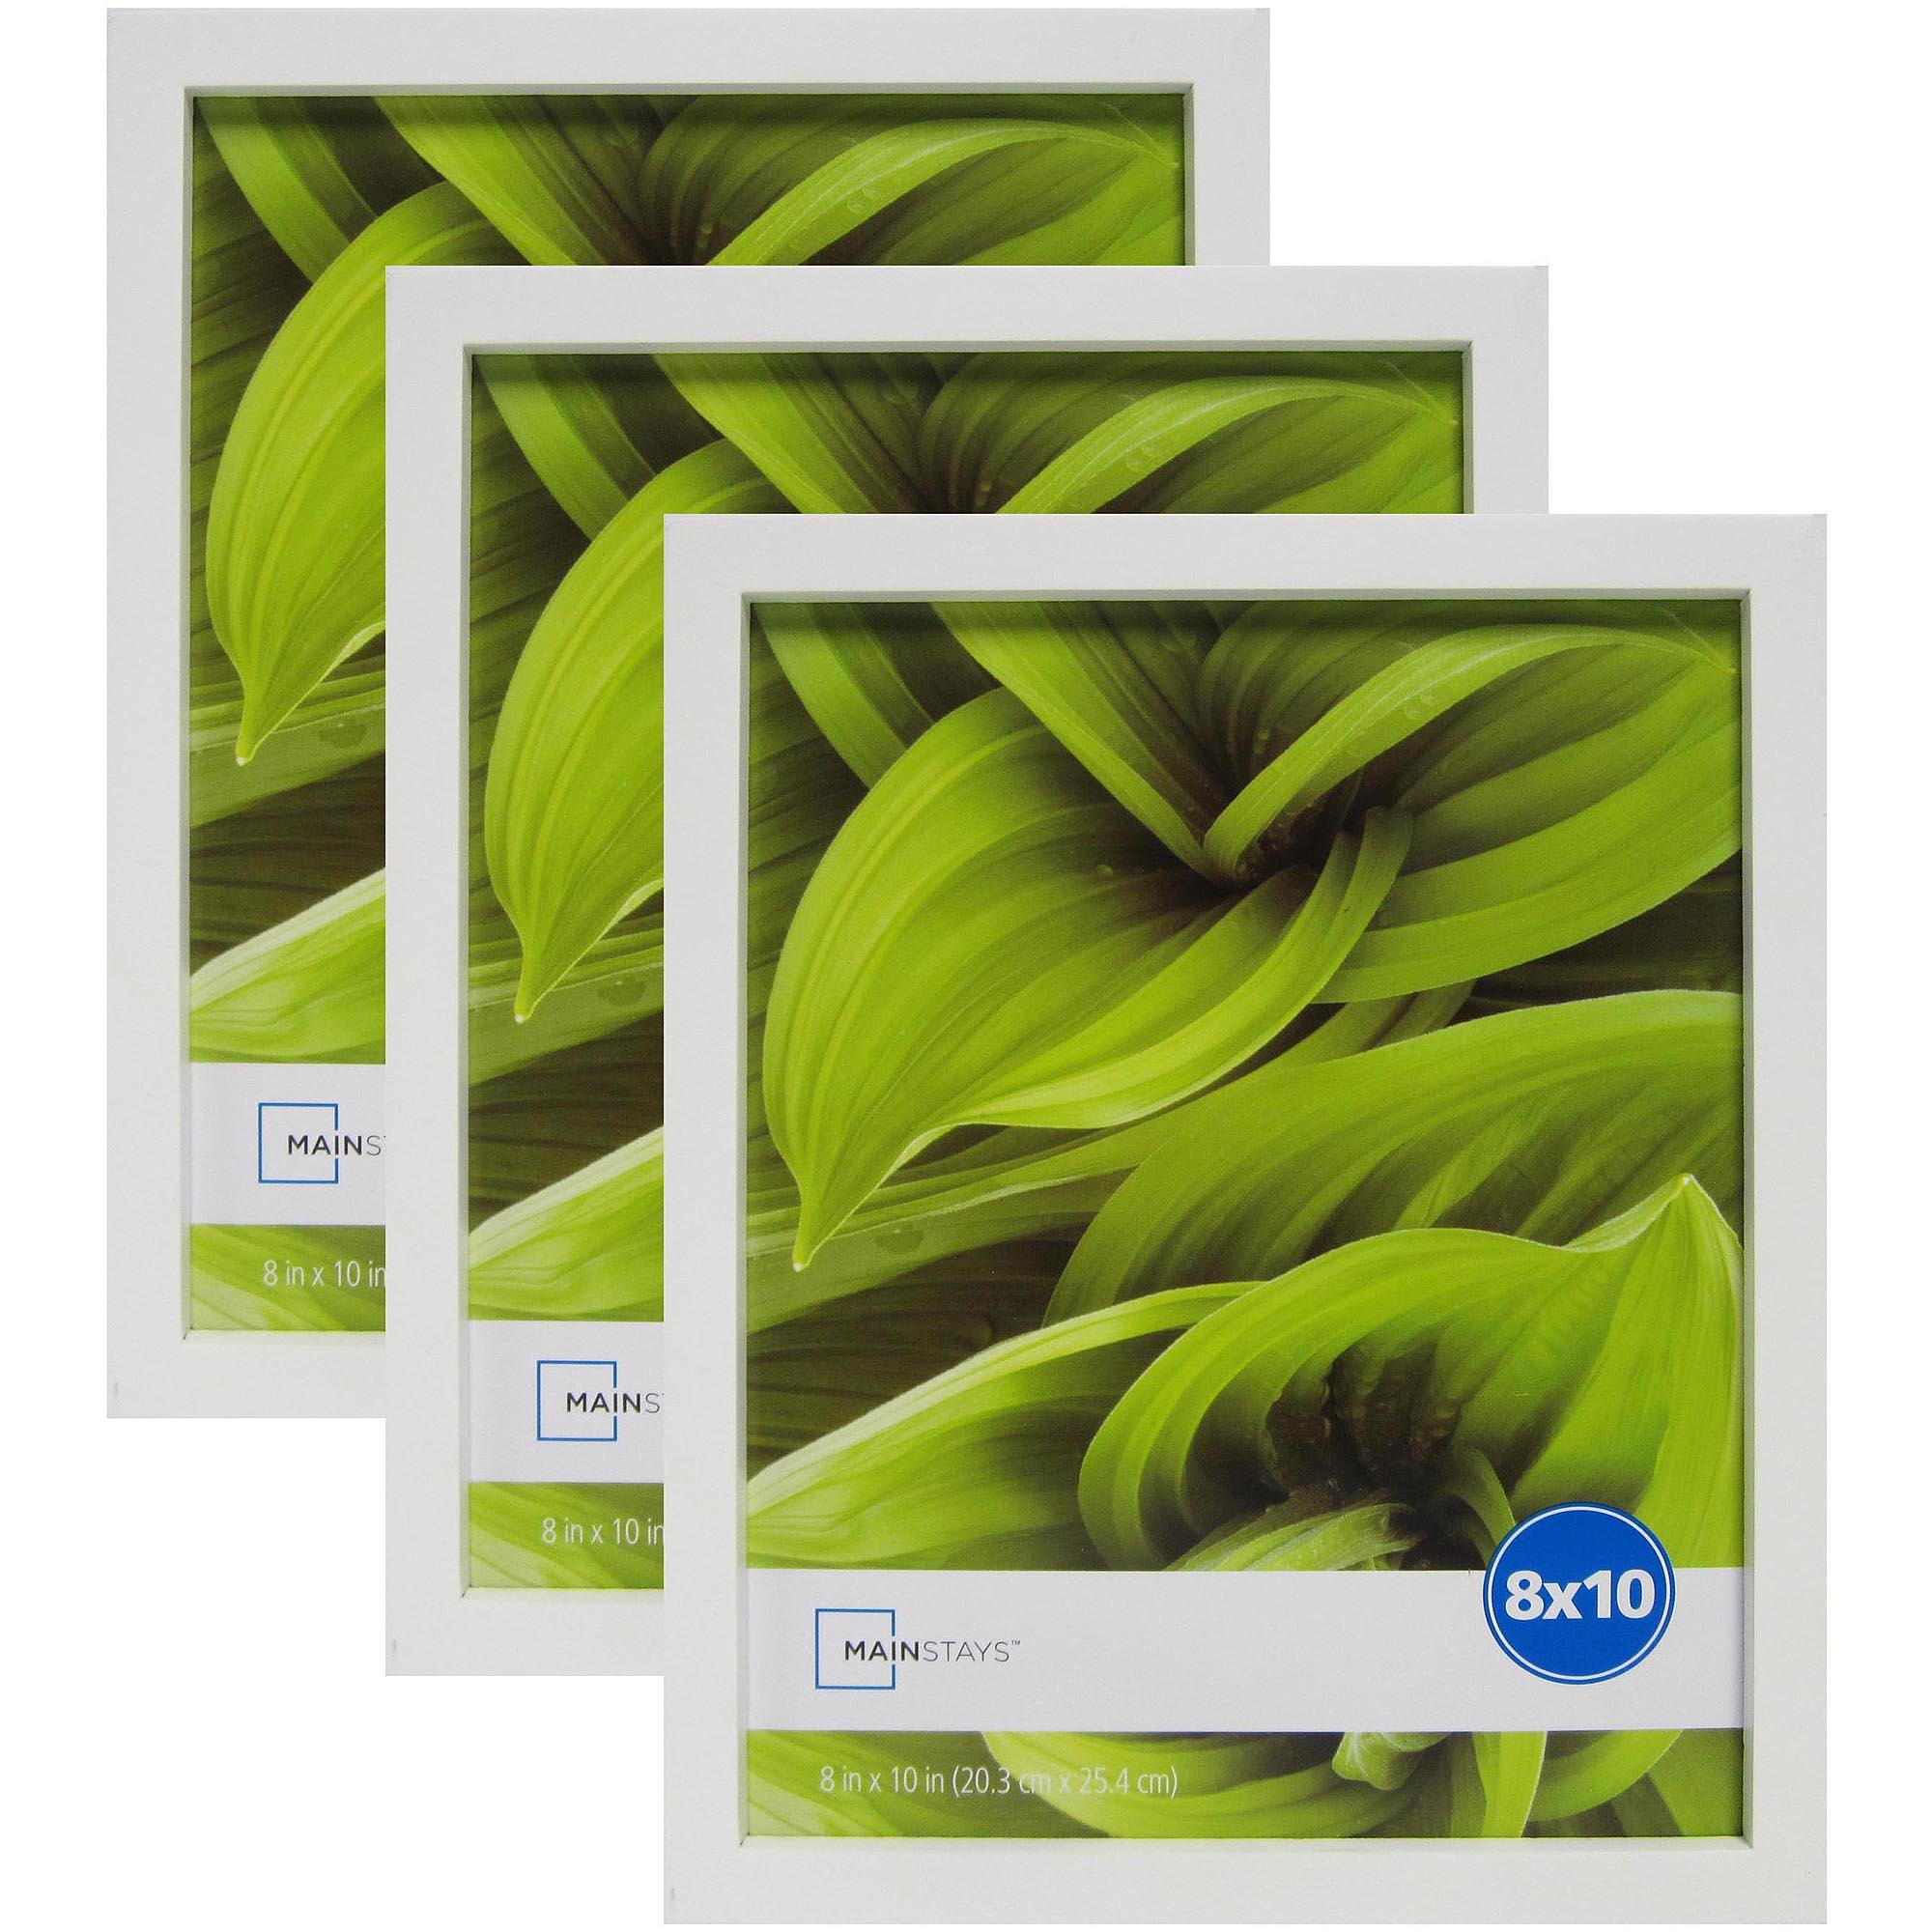 Mainstays Linear 8x10 Frames, White, 3-Pack - Walmart.com